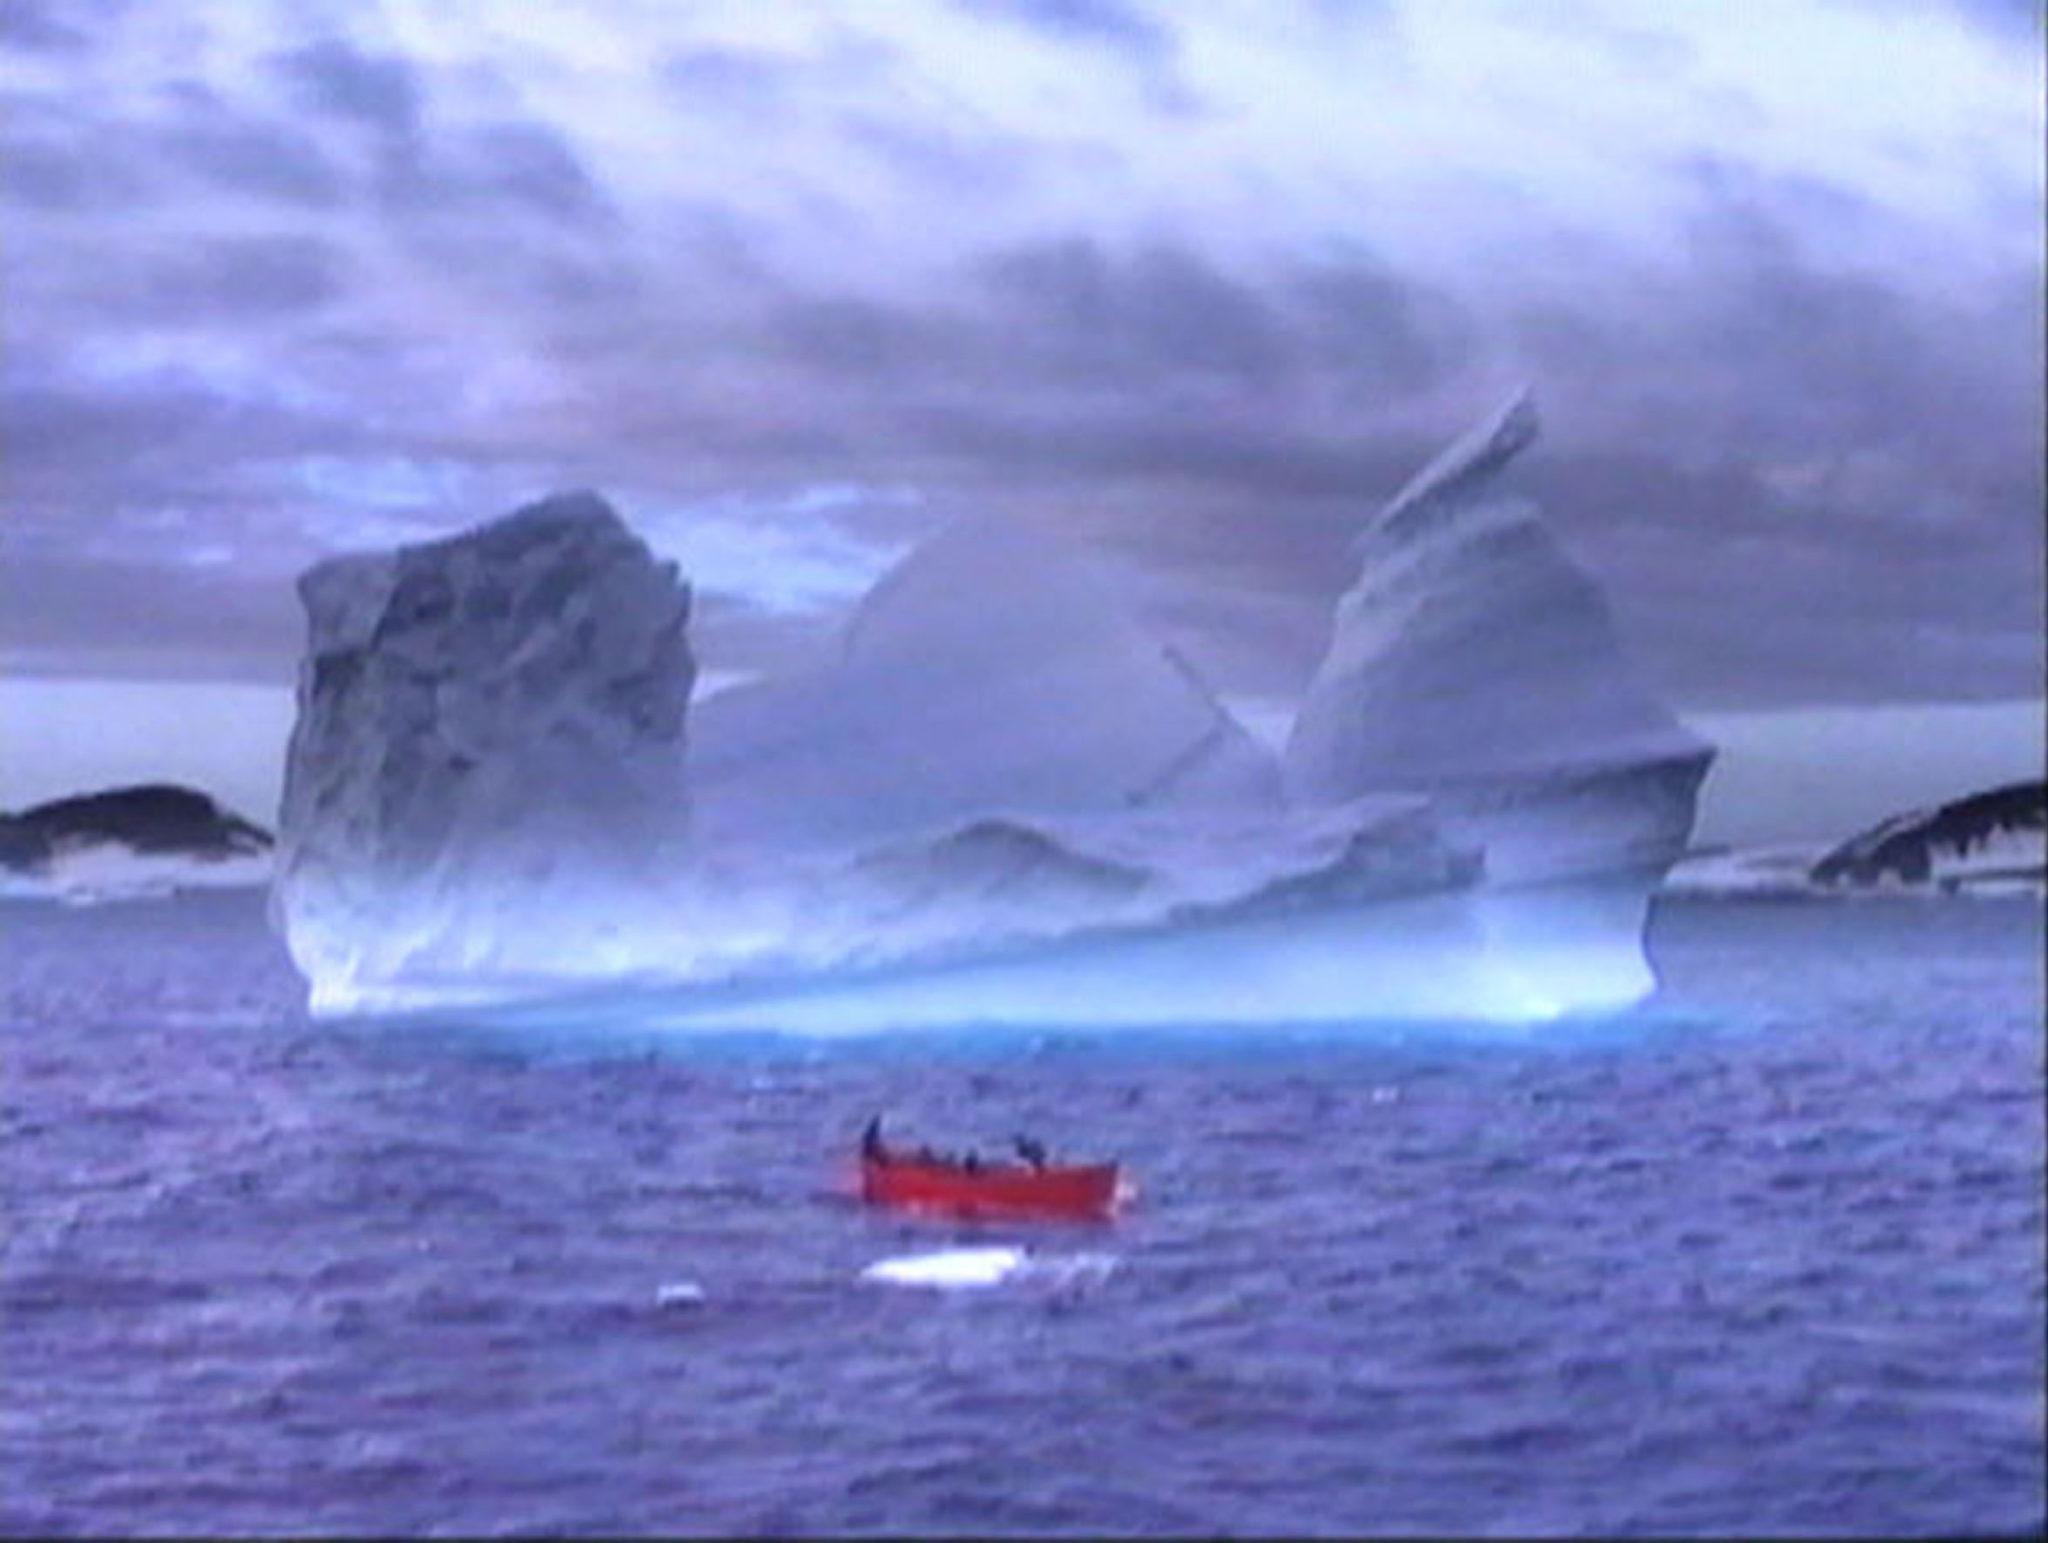 Cahen-Voyage-dhiver.jpg